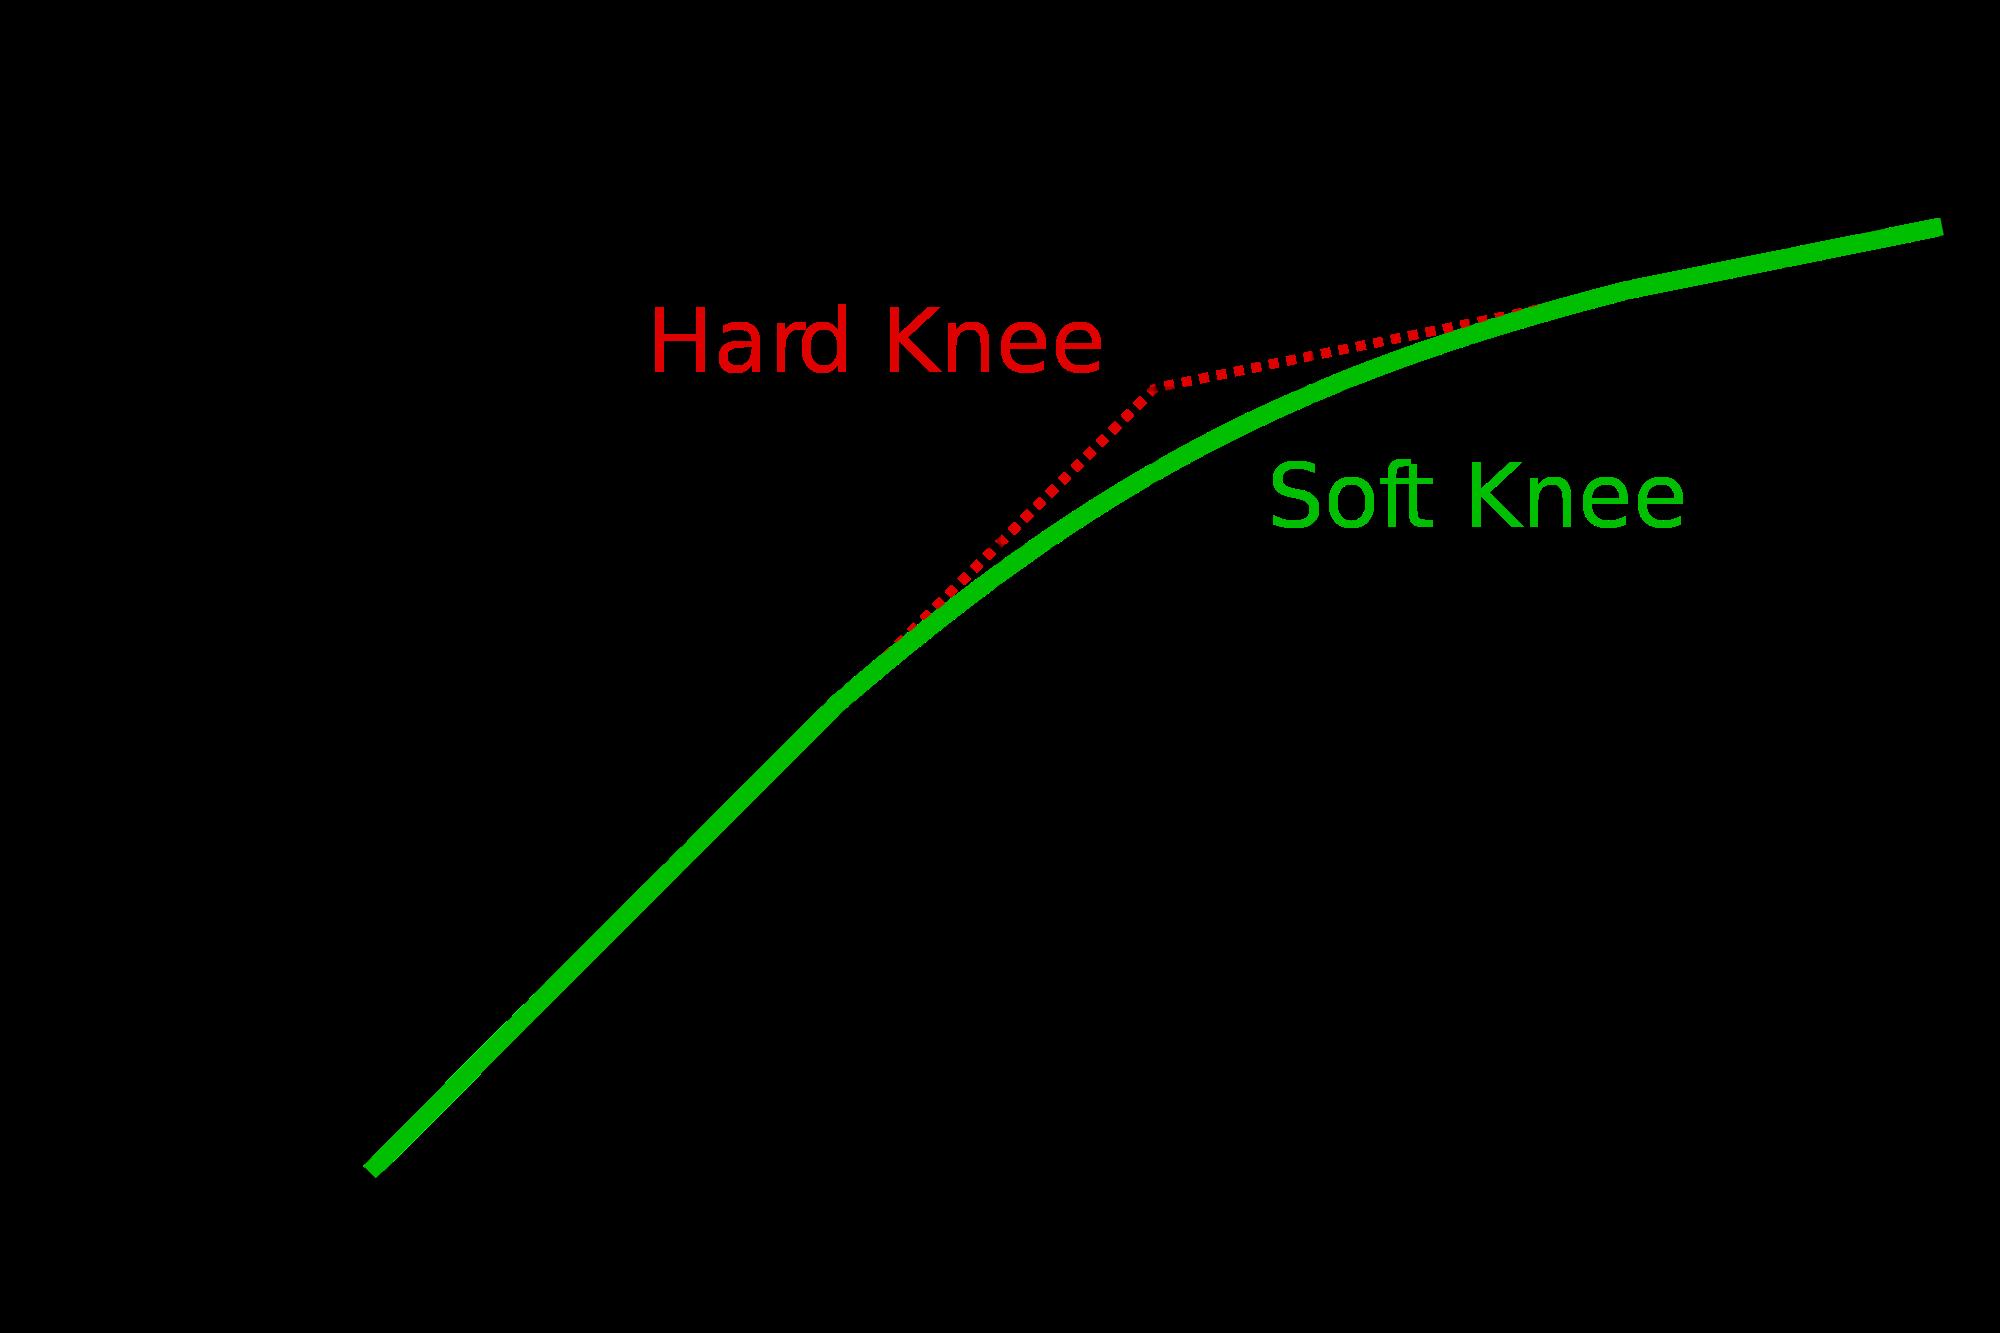 Hard knee vs. soft knee